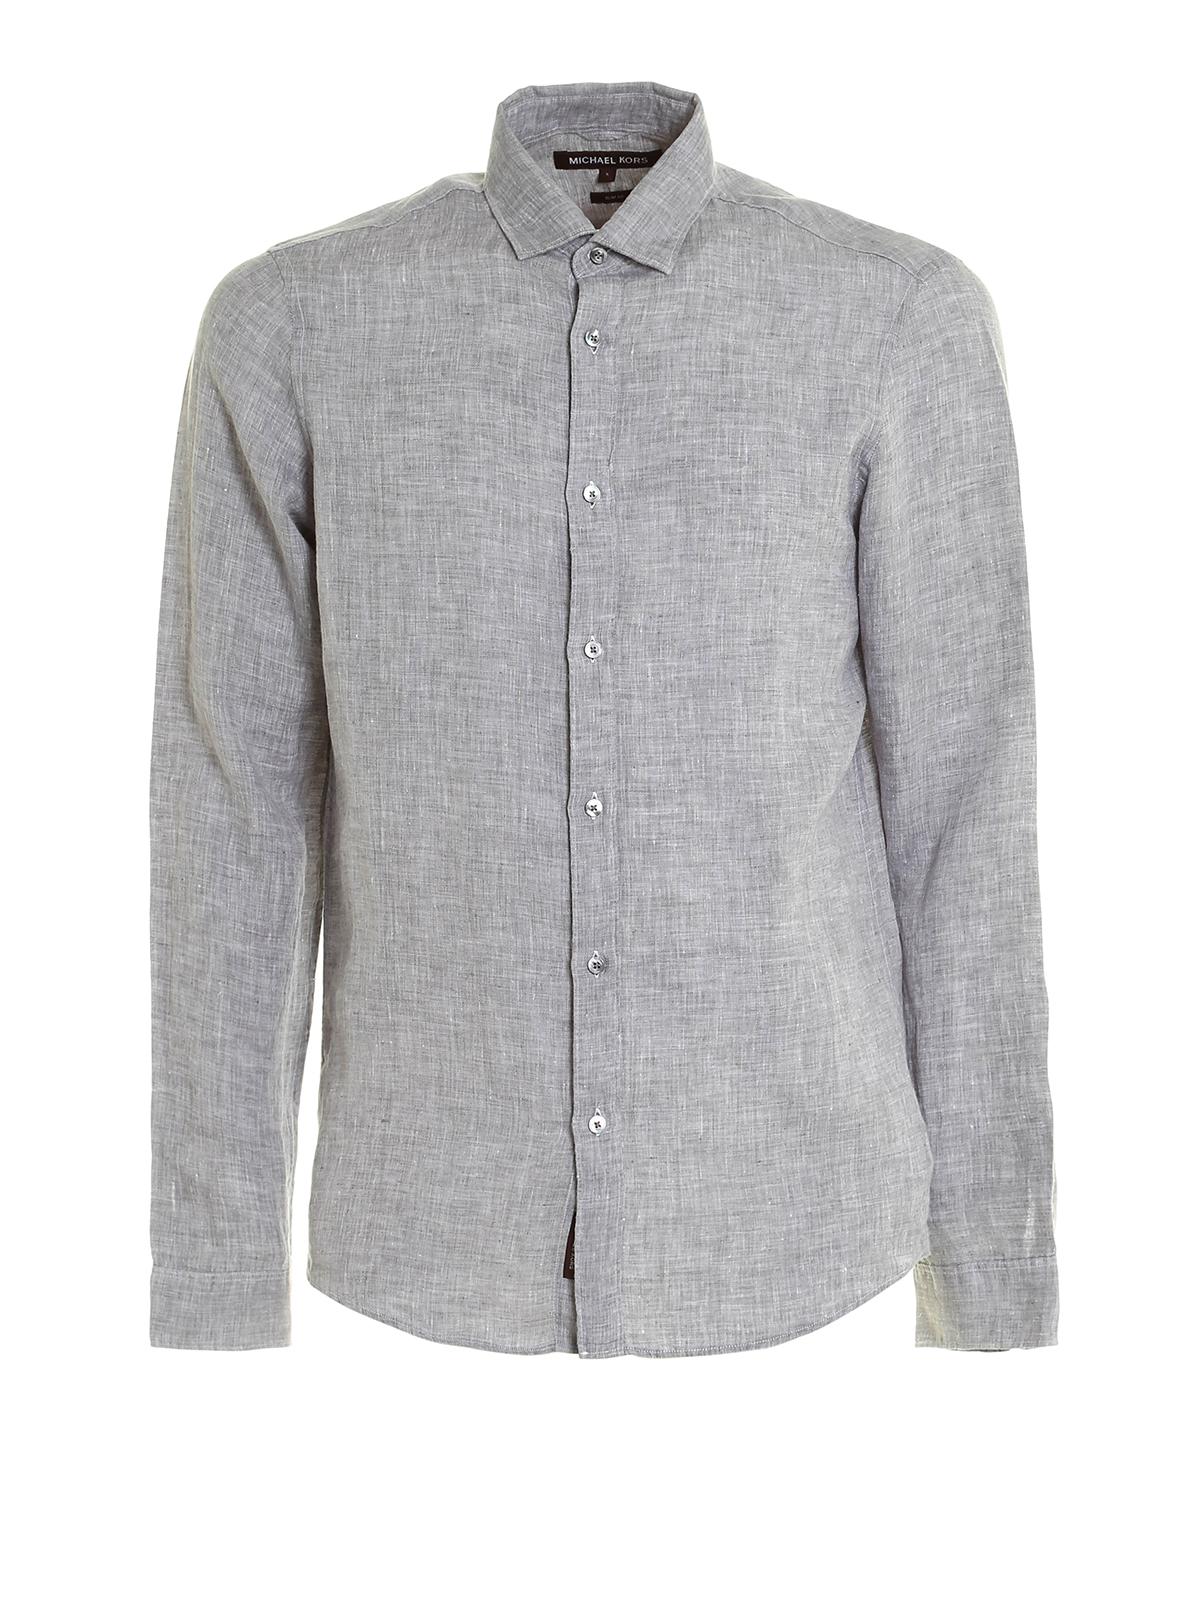 332cf16396f3 Michael Kors - Slim fit linen shirt - shirts - CS74CBU2GR063